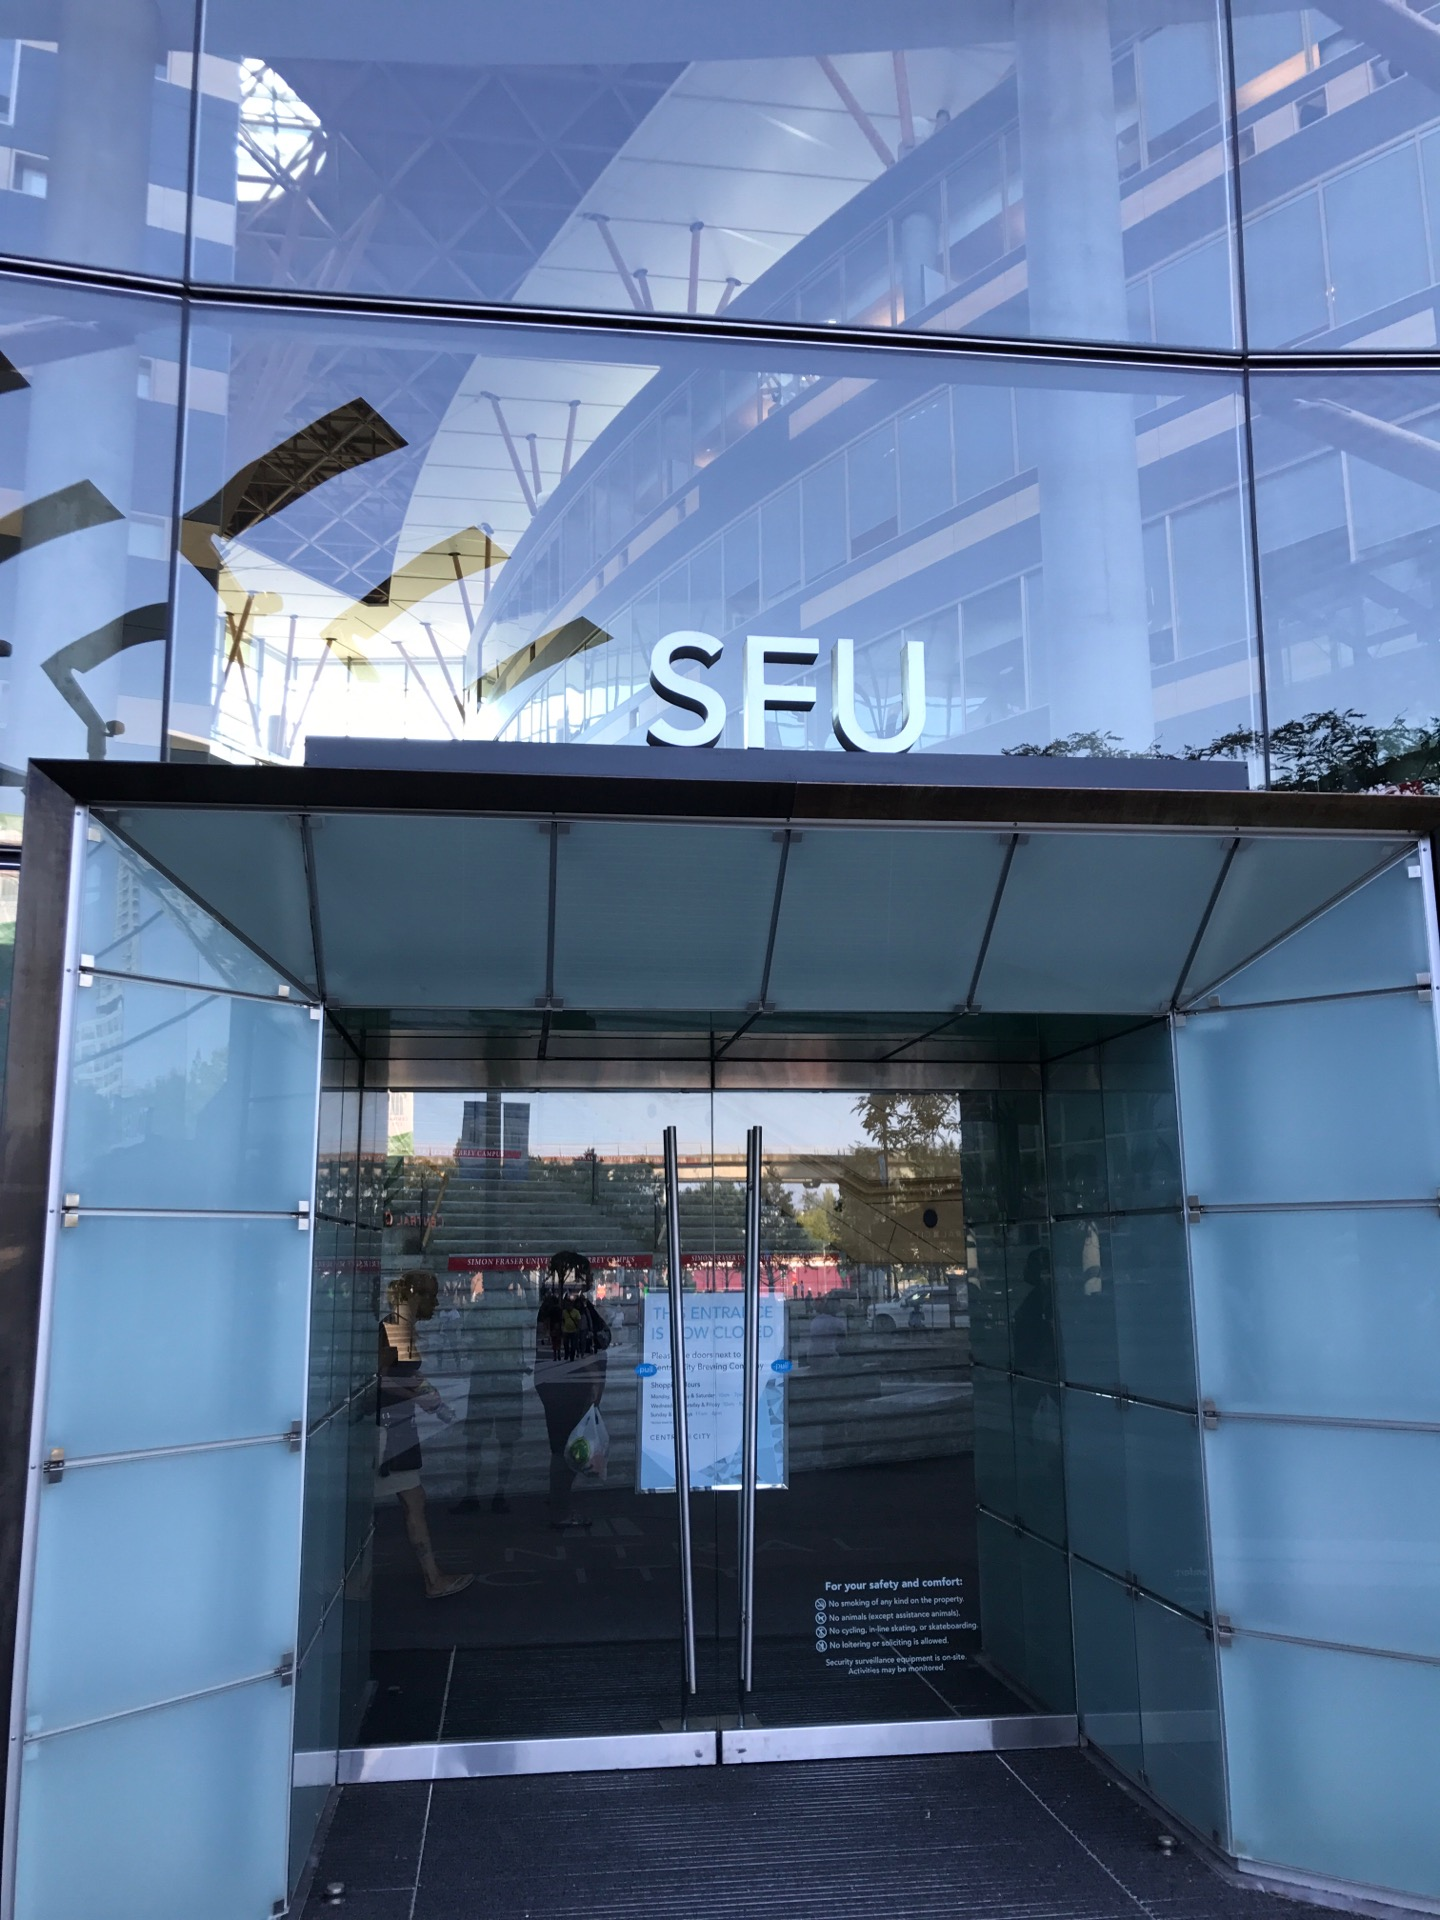 SFU Surrey: Business Lounge | 250-13450 102 Ave, Surrey, BC V3T 0A3 | +1 778-782-8019